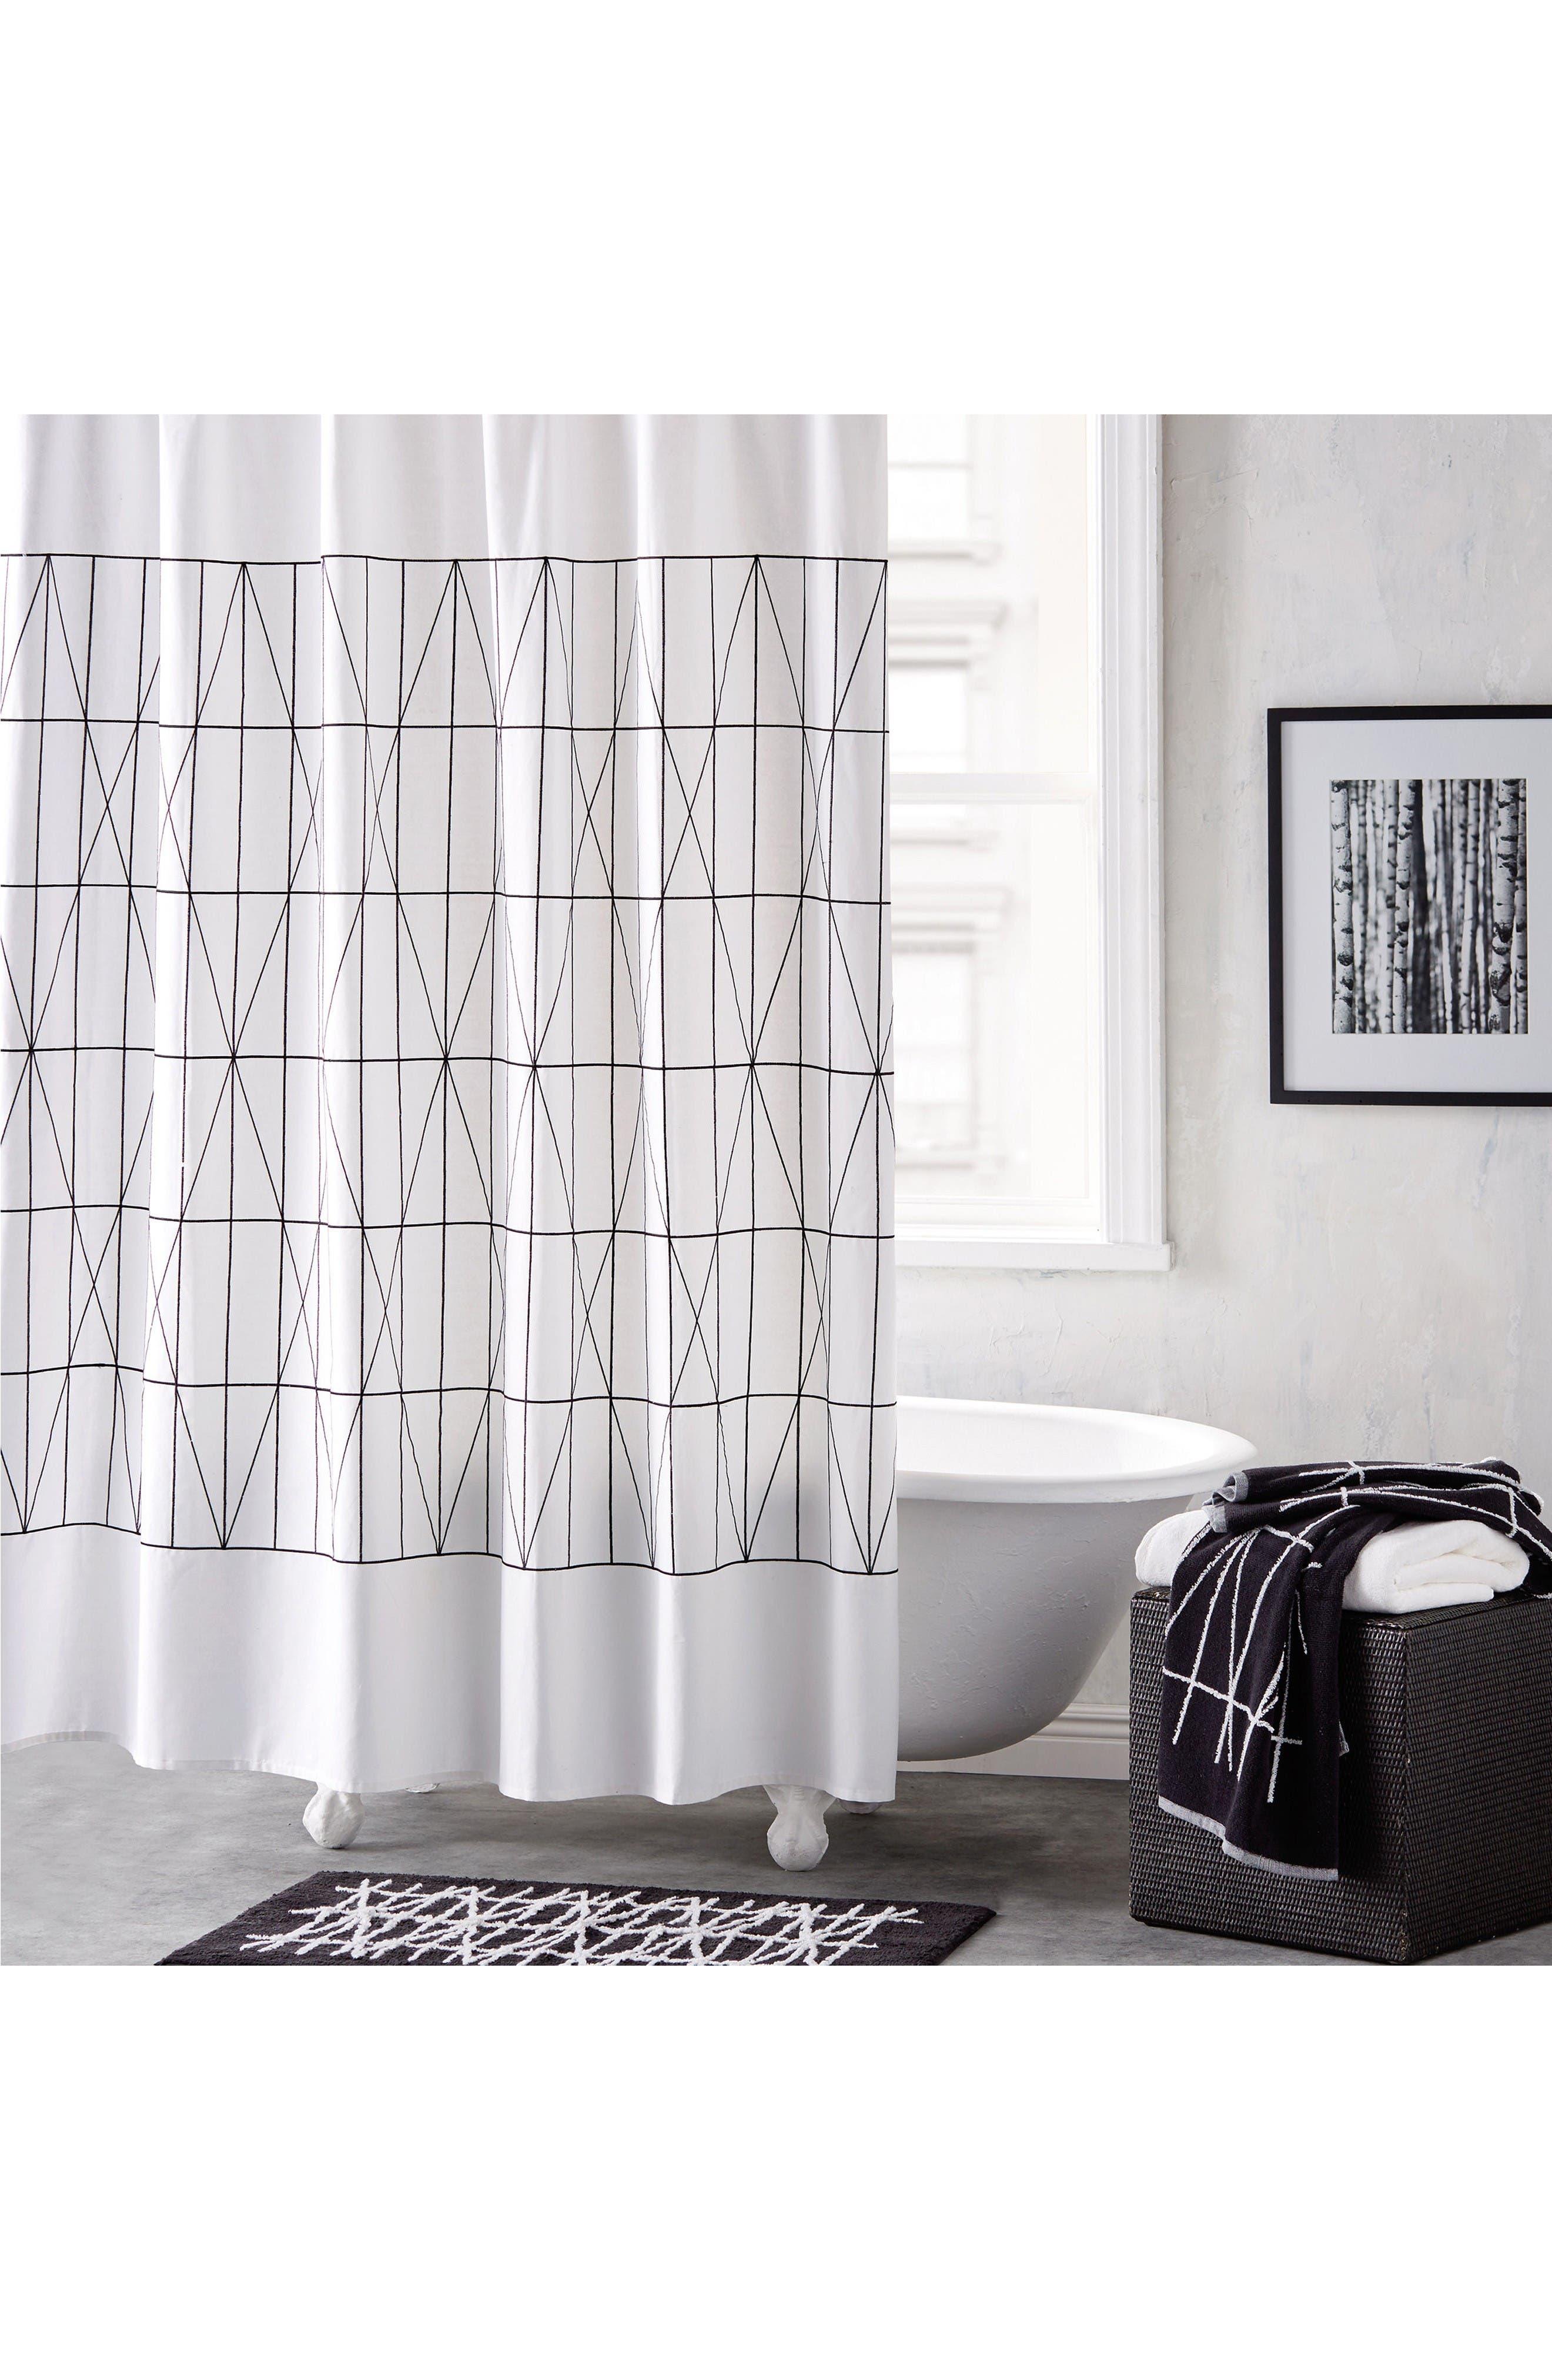 Kraken shower curtain - Kraken Shower Curtain 50